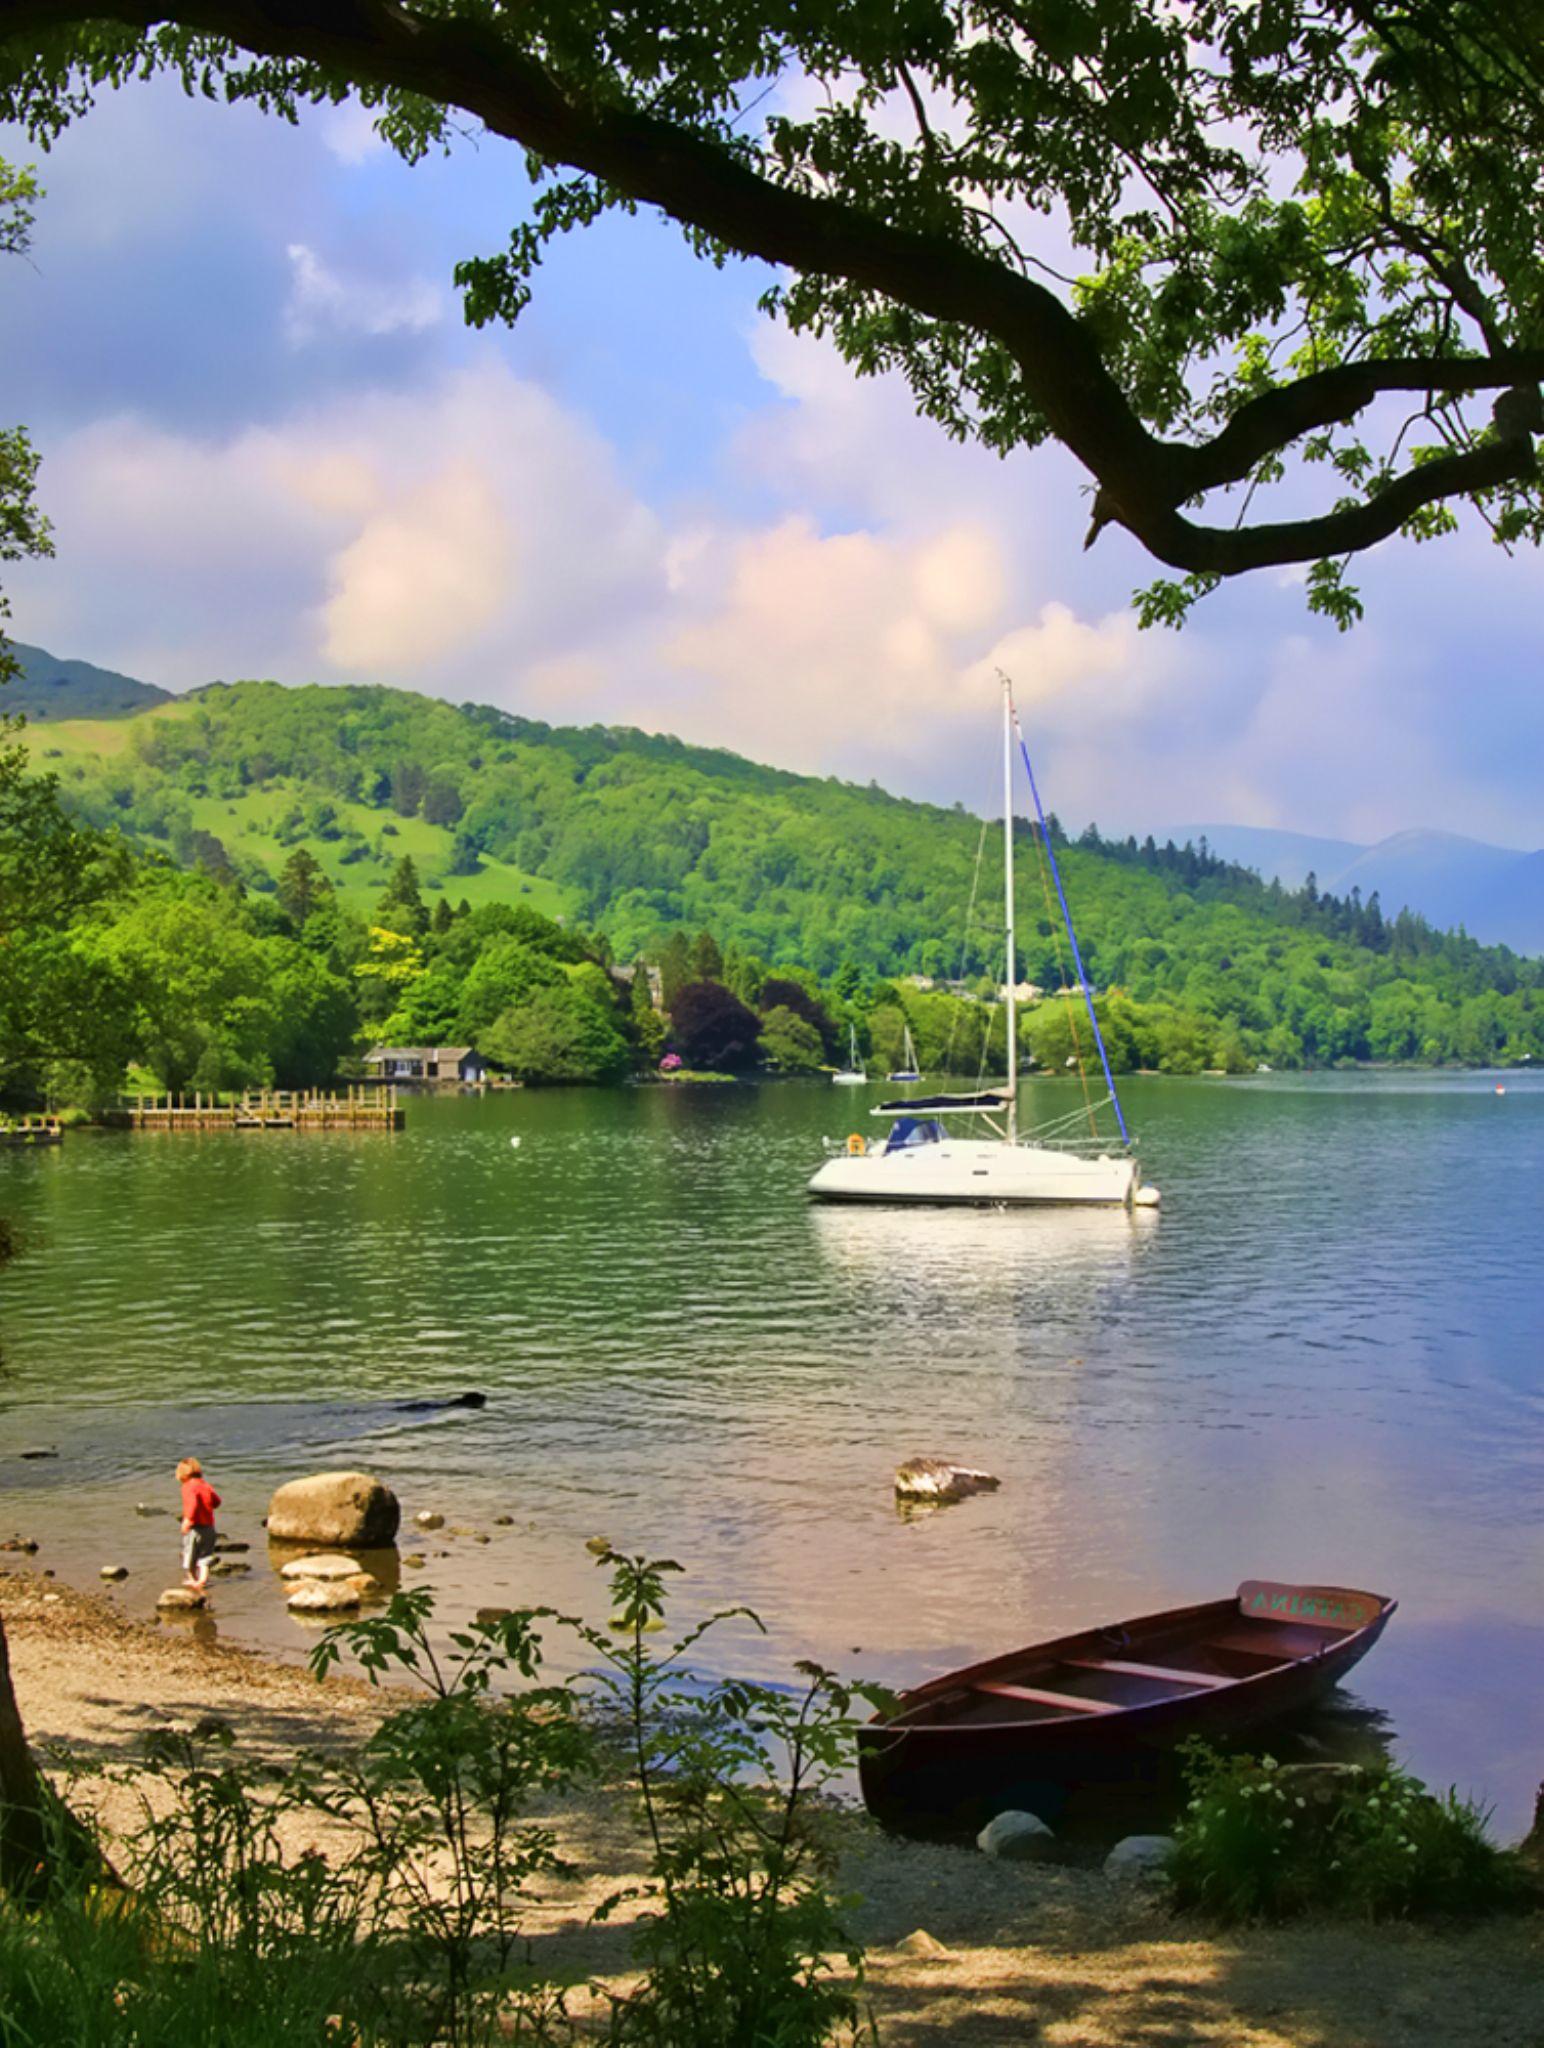 Lake Windermere .  Cumbria . UK. by geofftodhunter